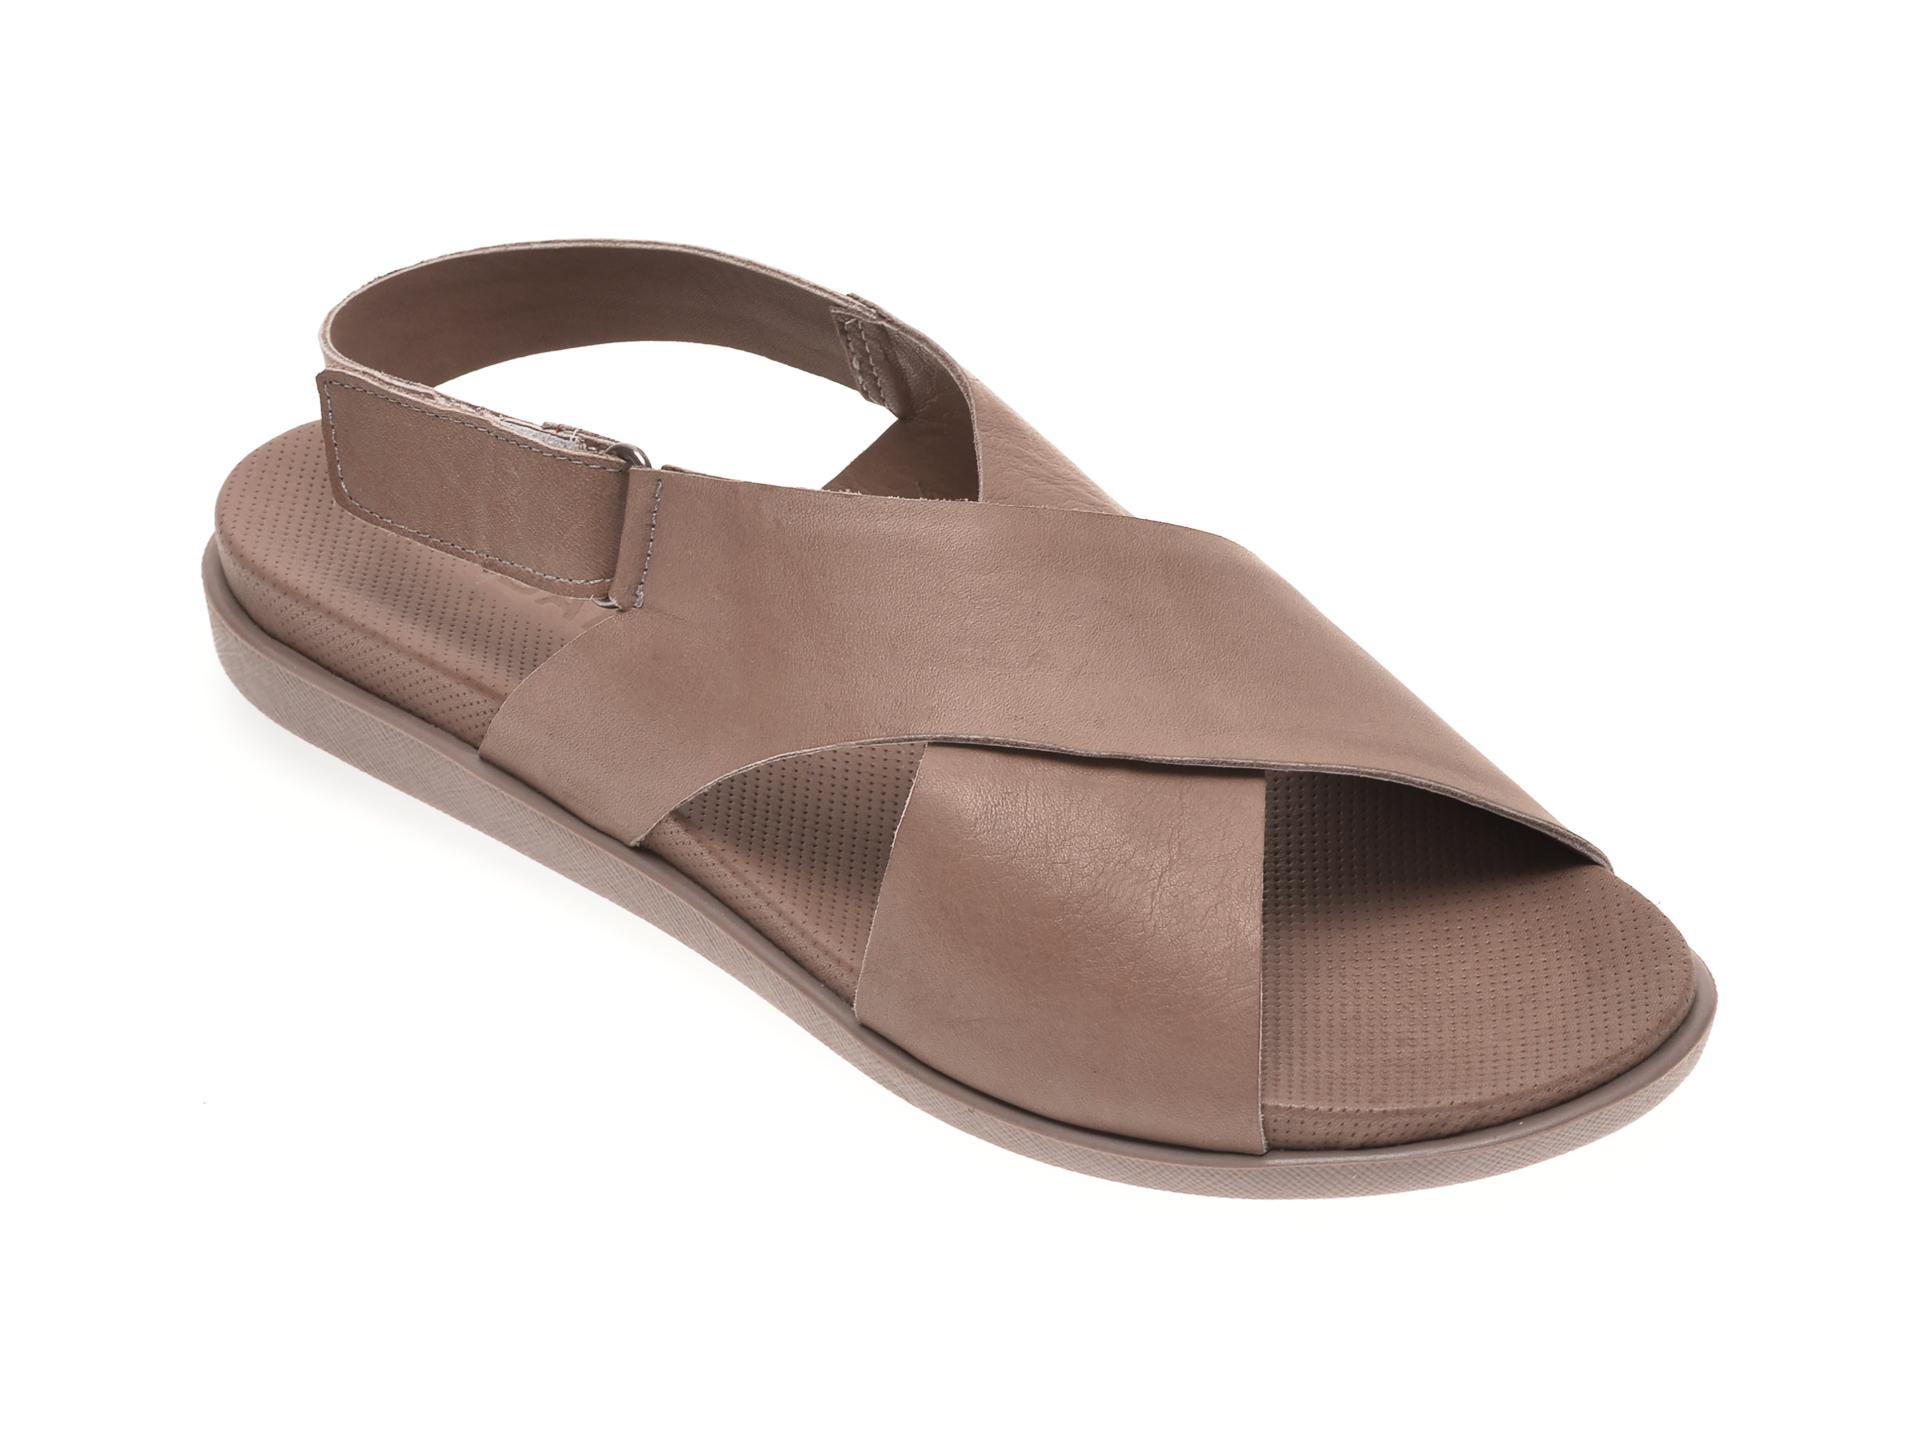 Sandale BABOOS gri, 1401, din piele naturala